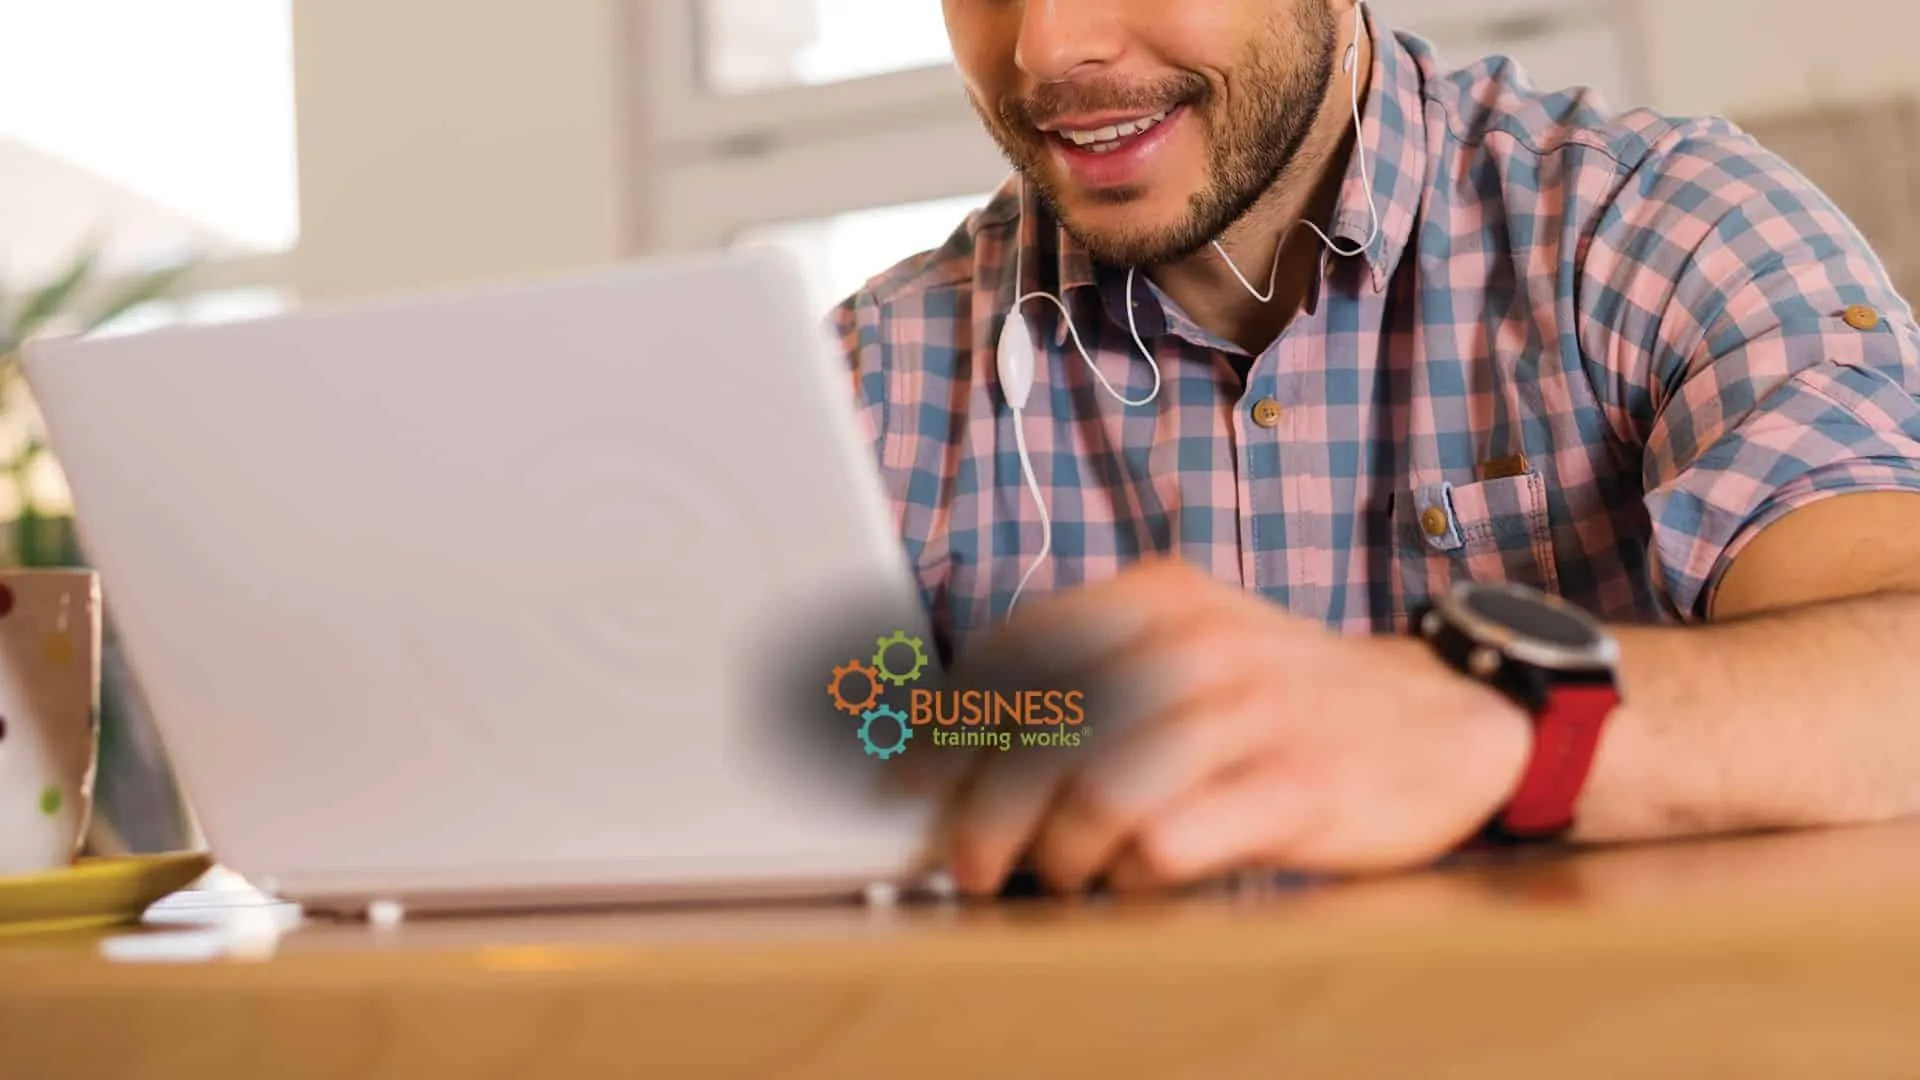 Web-Based Zoom Presentation Skills Course